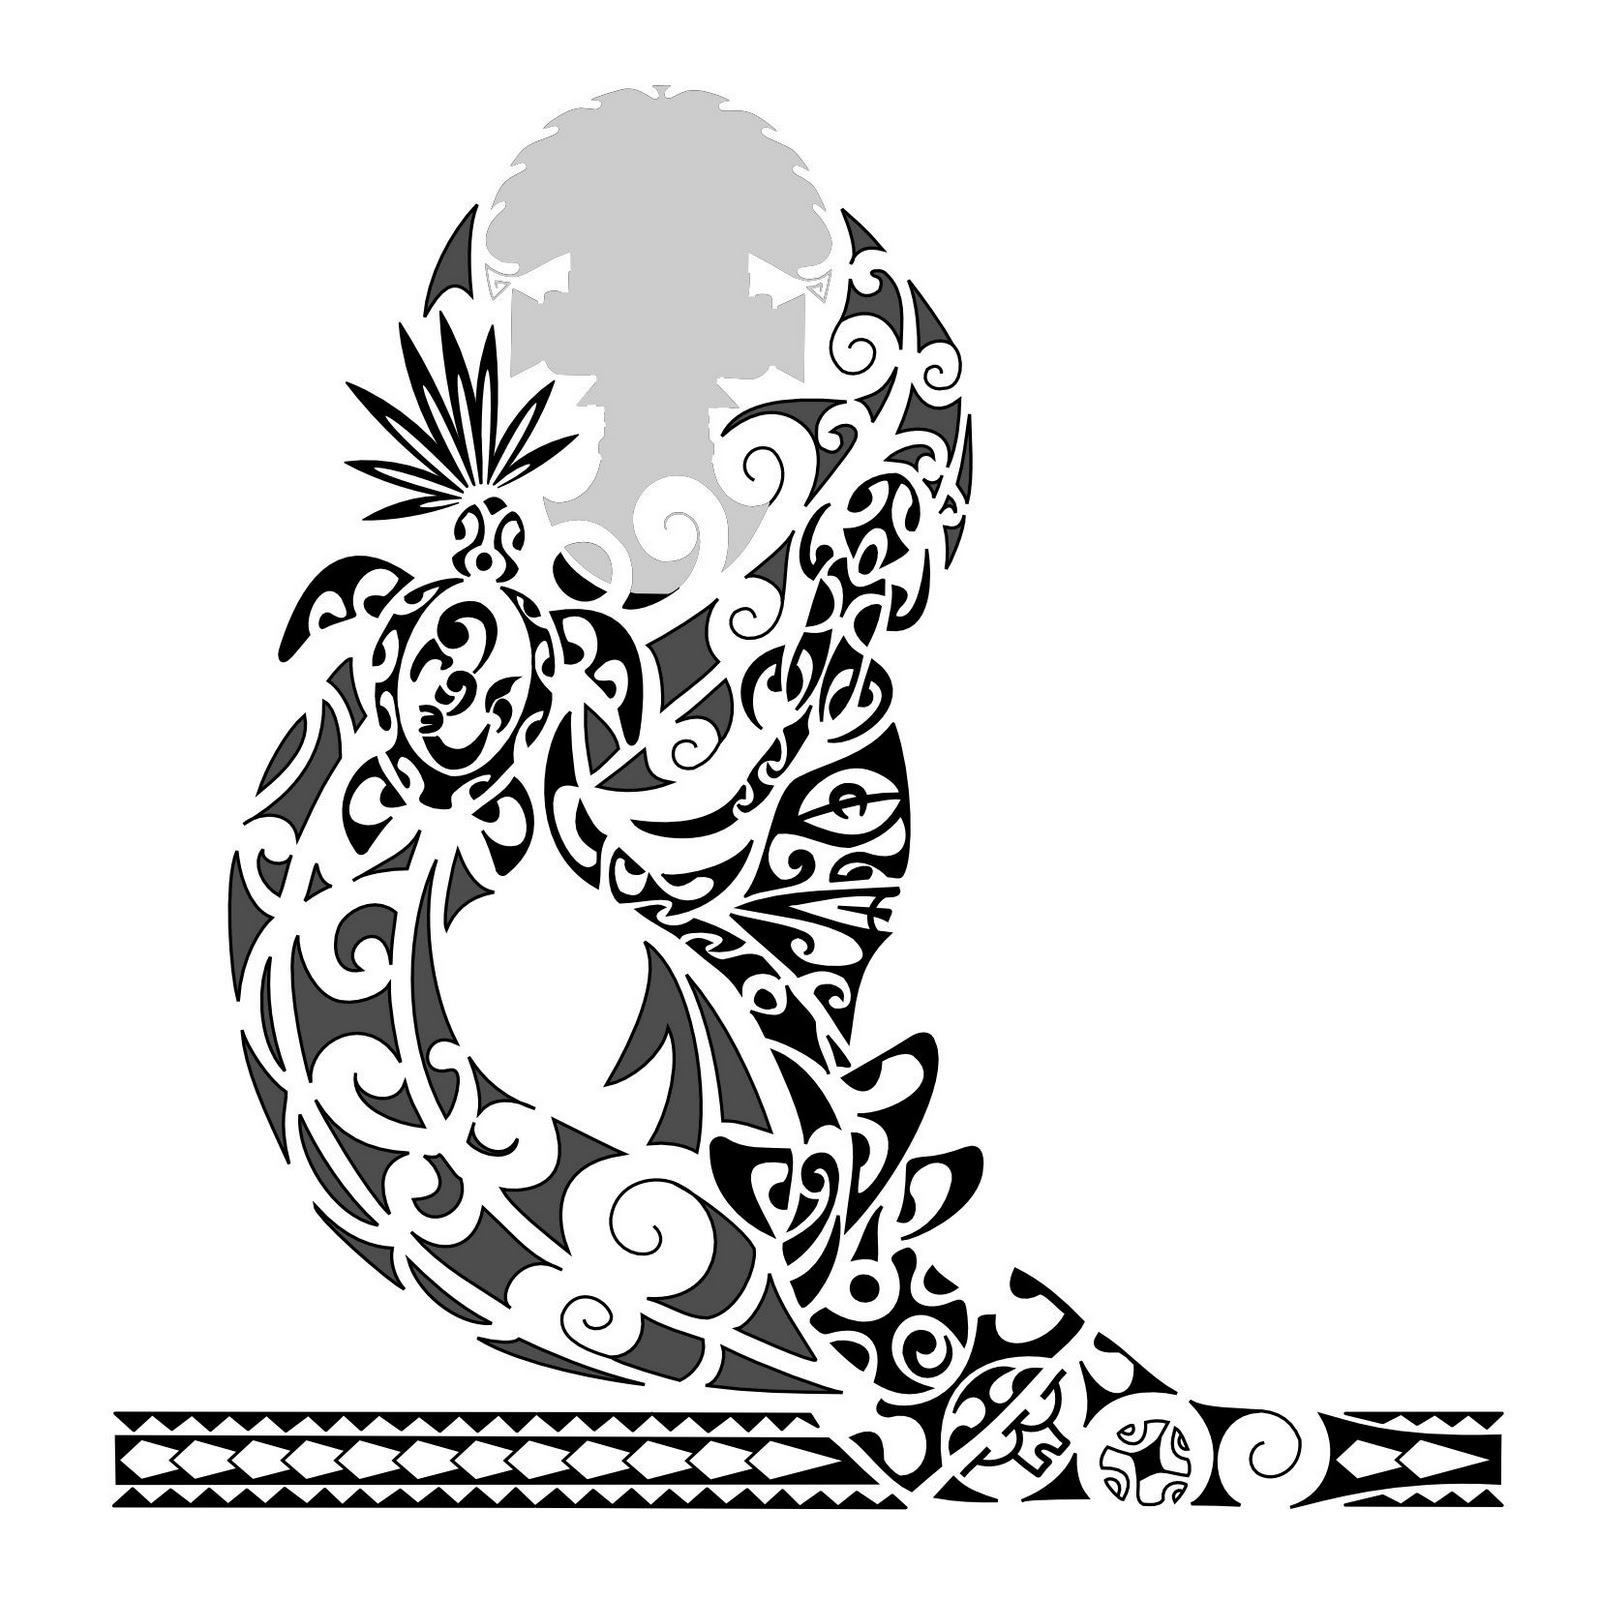 Ben noto Blu Sky Tattoo Studio: Maori Significato 74 BK53